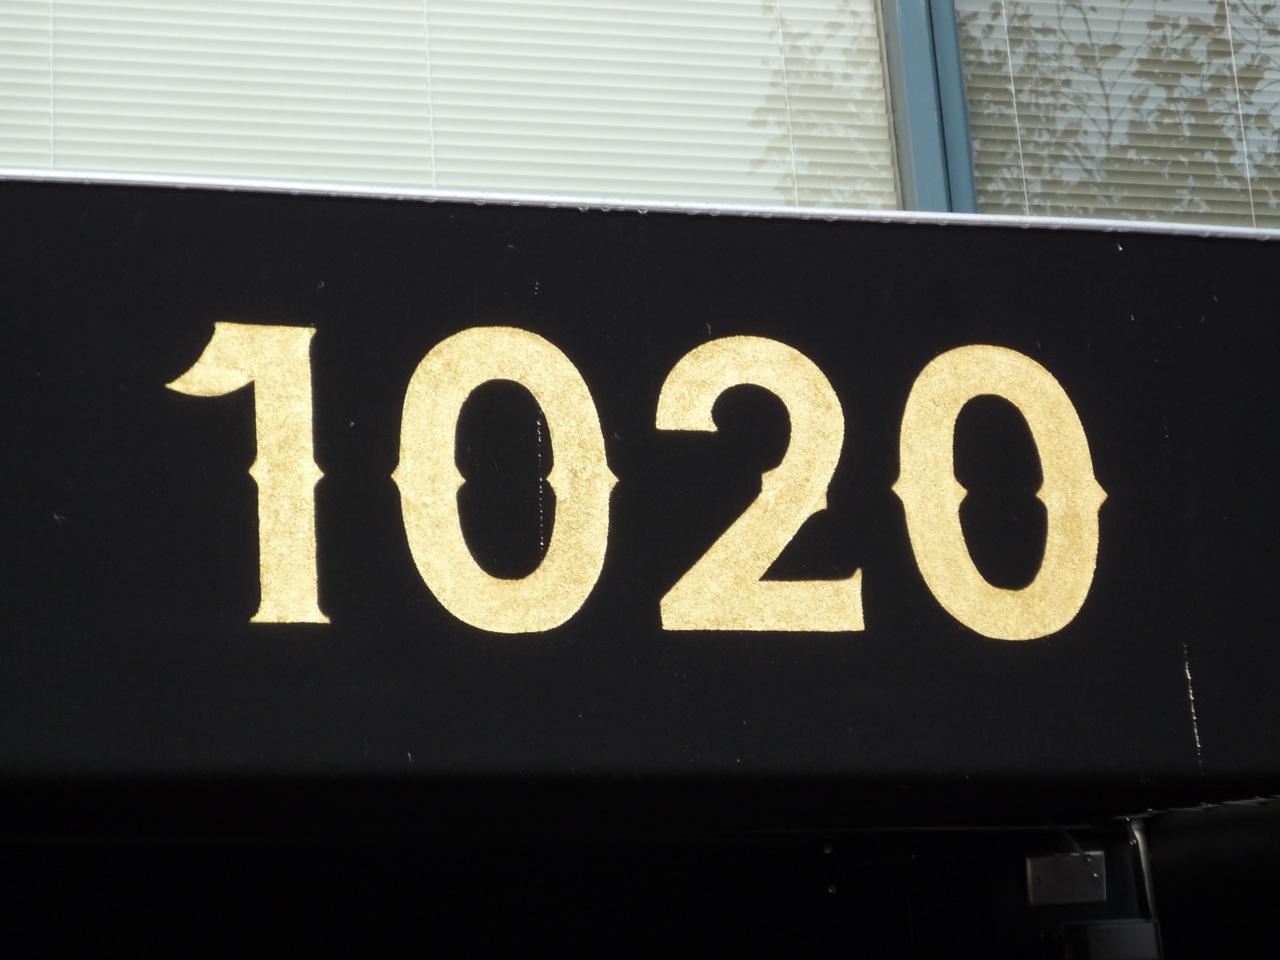 TRANSOM-gilded-awning-address-for-showdogs-1020-market_5878232688_o.jpg